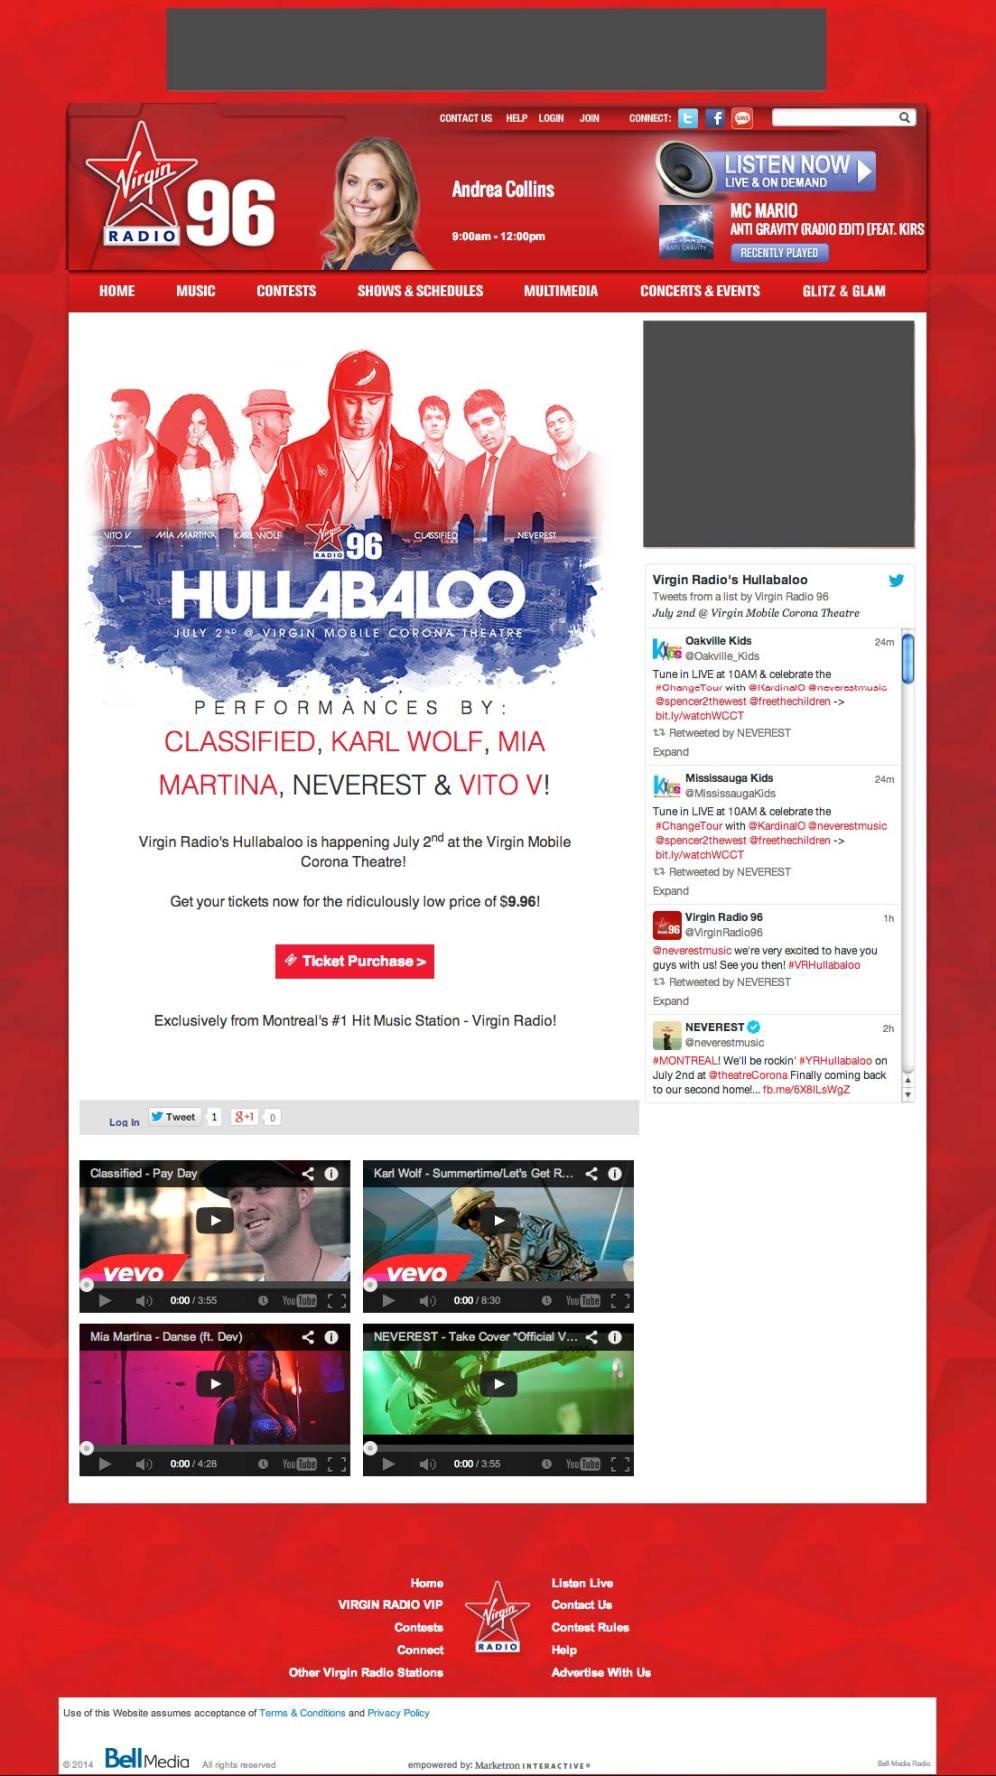 Virgin Radio's Hullabaloo Info page